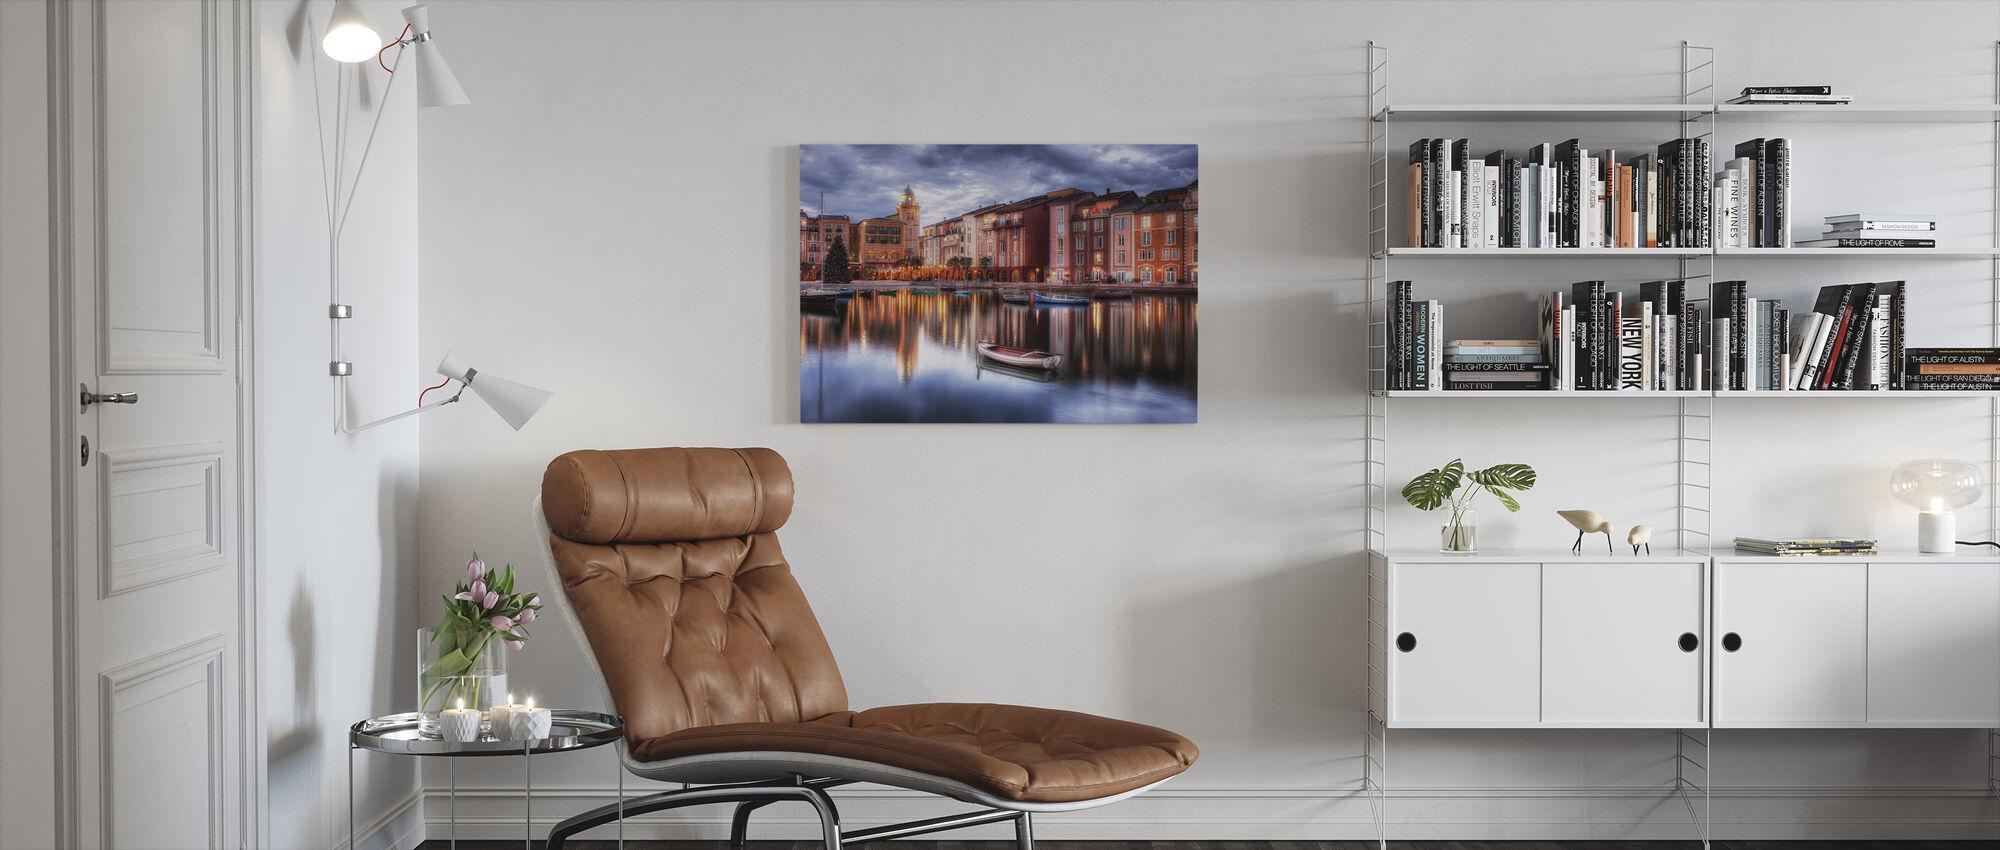 Portofino Bay Hotel in Orlando, Florida - Canvas print - Living Room